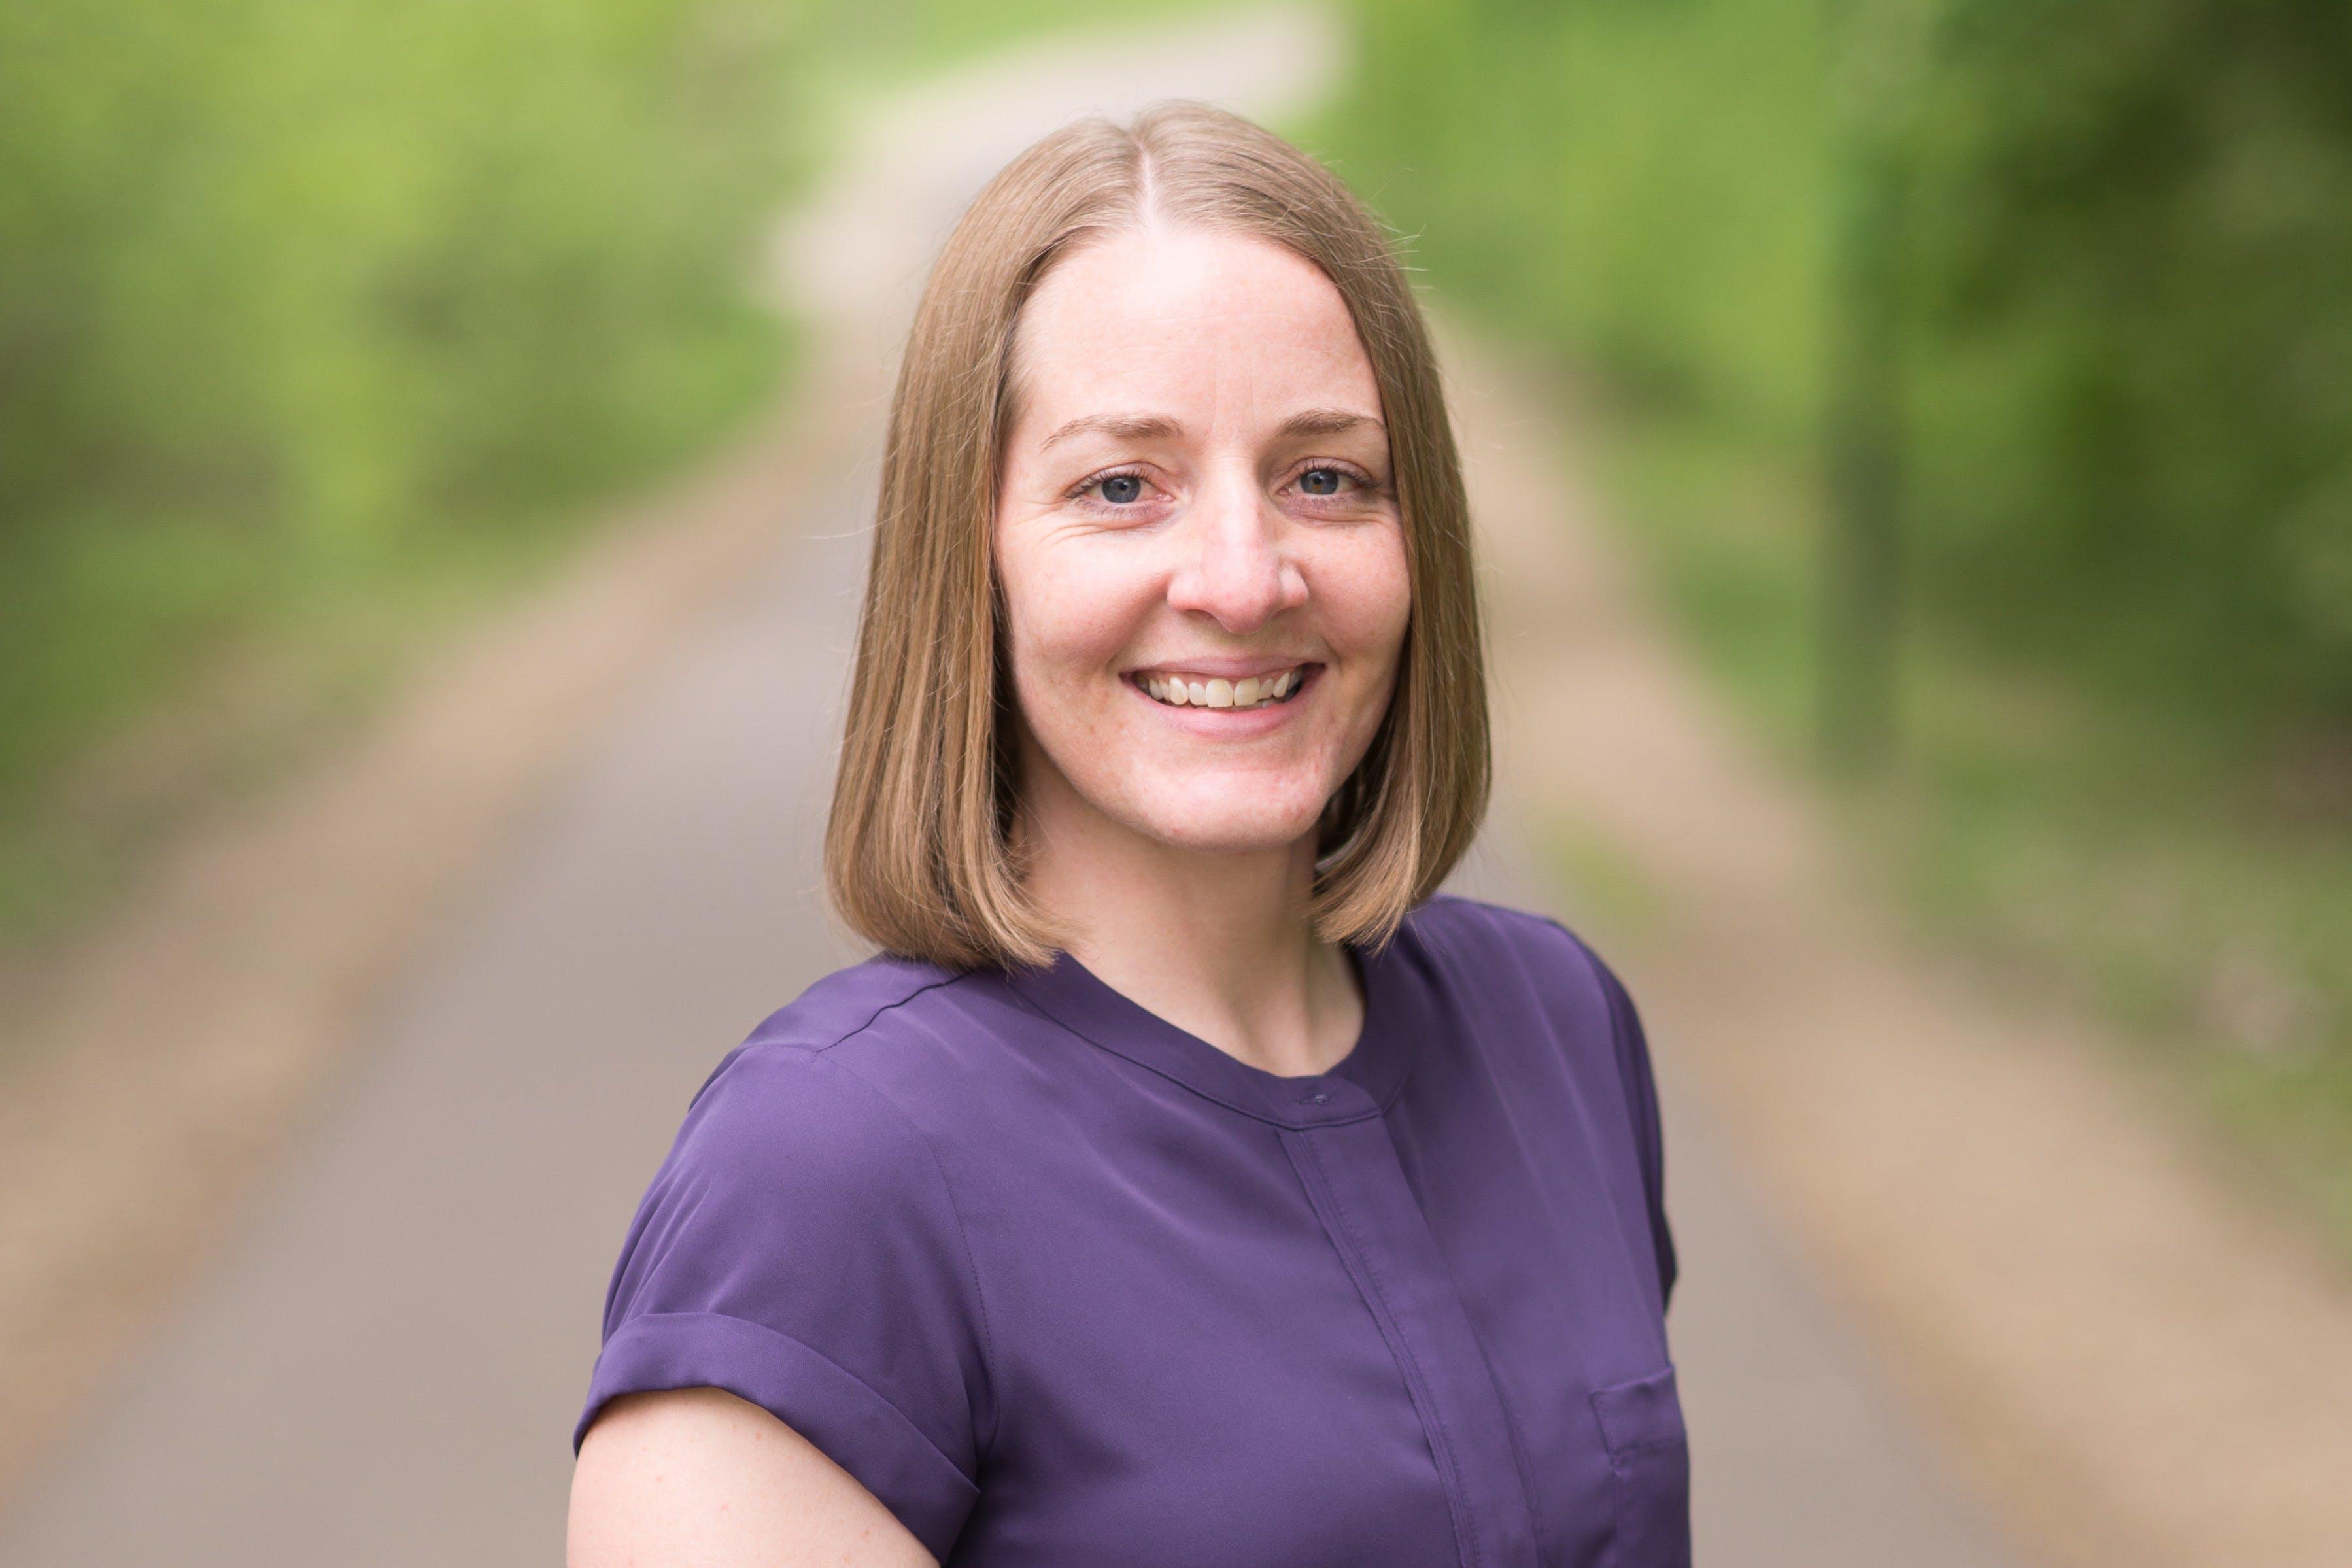 Professor Greta Schutte Personifies Salt and Light